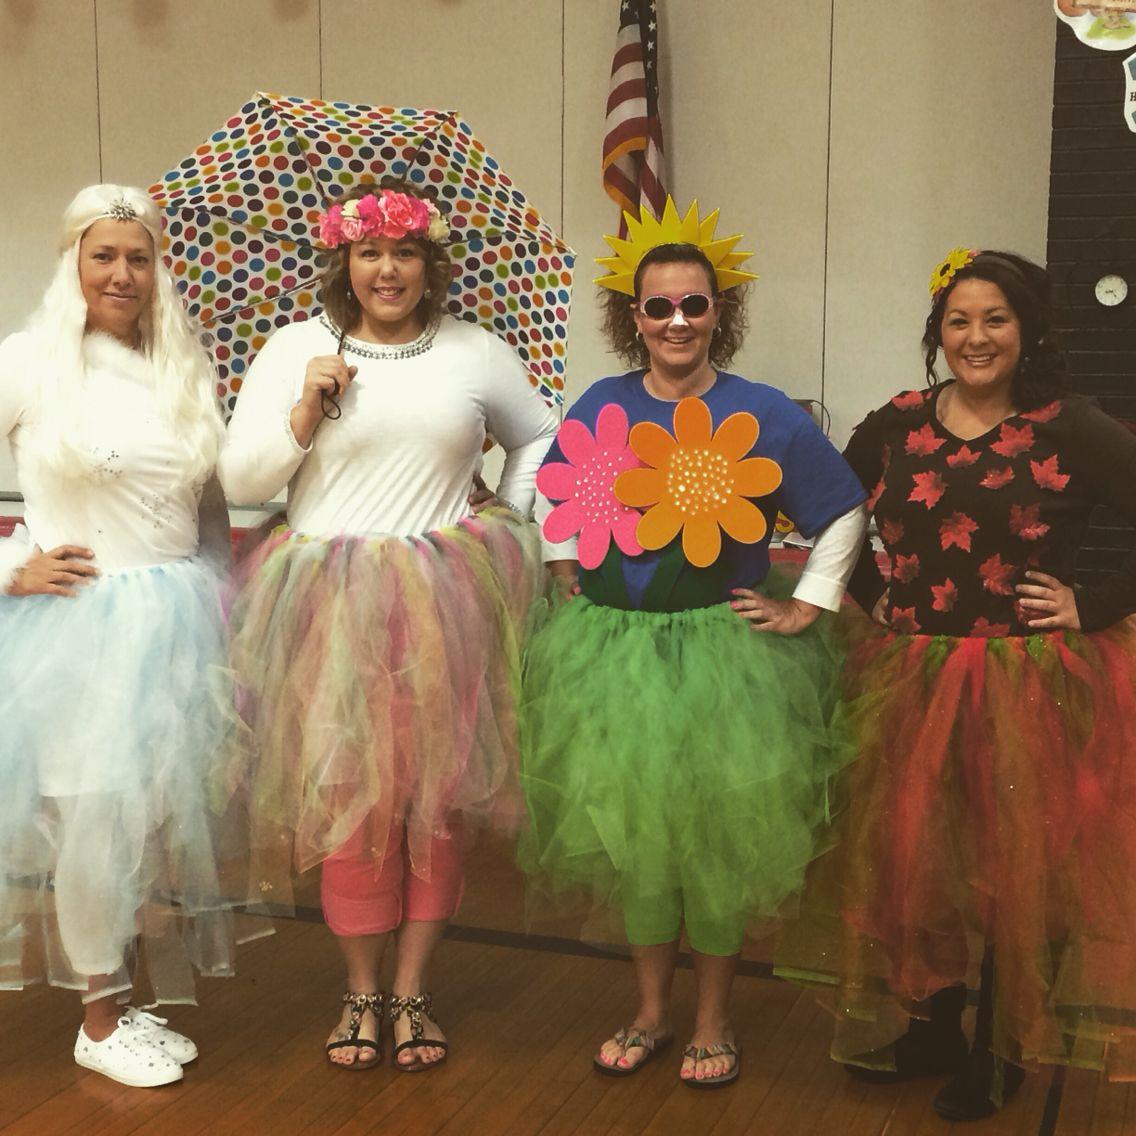 The Four Seasons Halloween Costume